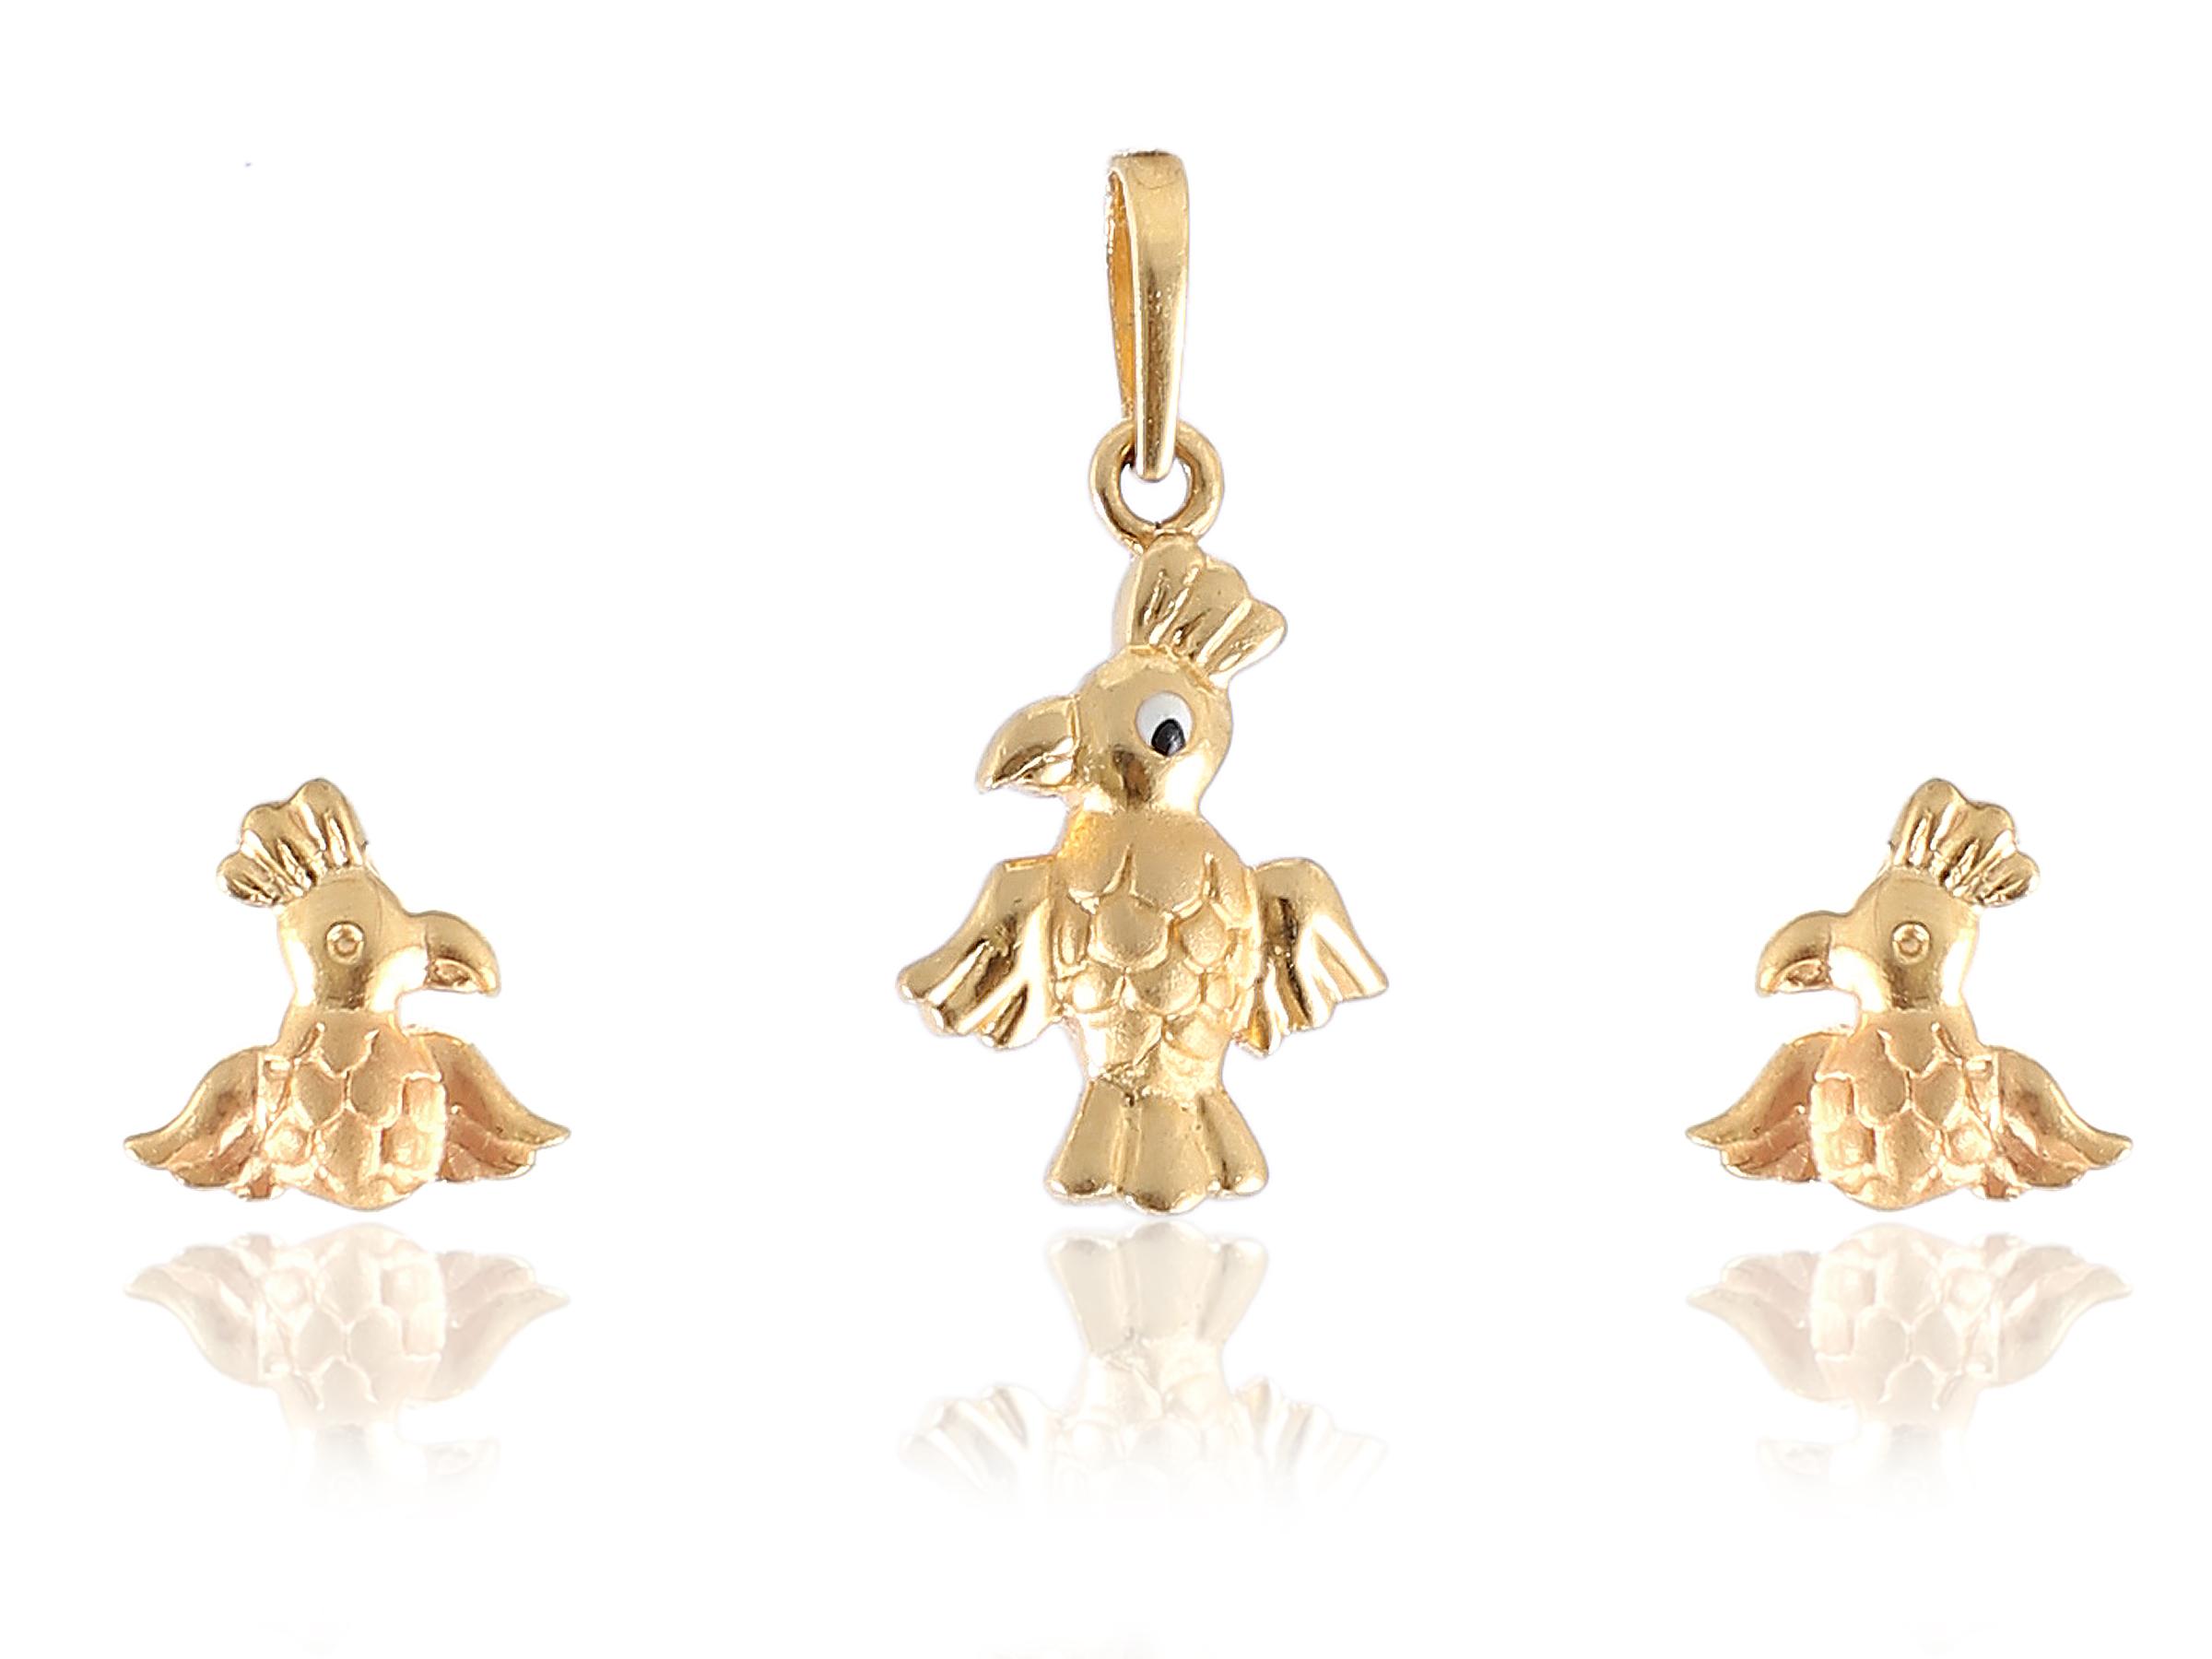 Pendant Earring Set In BIS Hallmark 22KT Gold